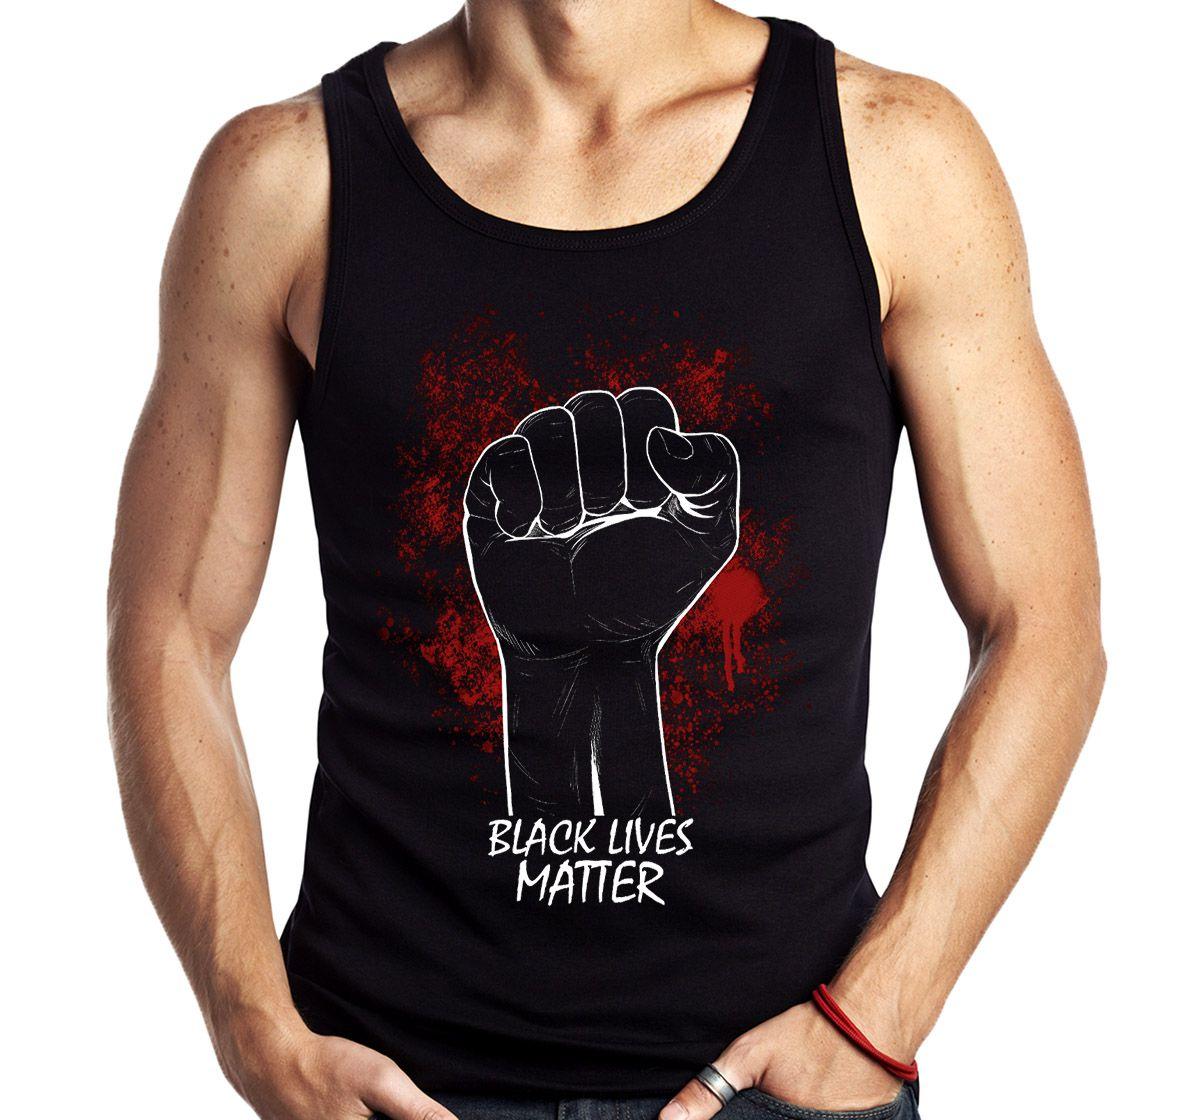 Camiseta Regata Black Lives Matter Protesto Movimento Social  - Dragon Store